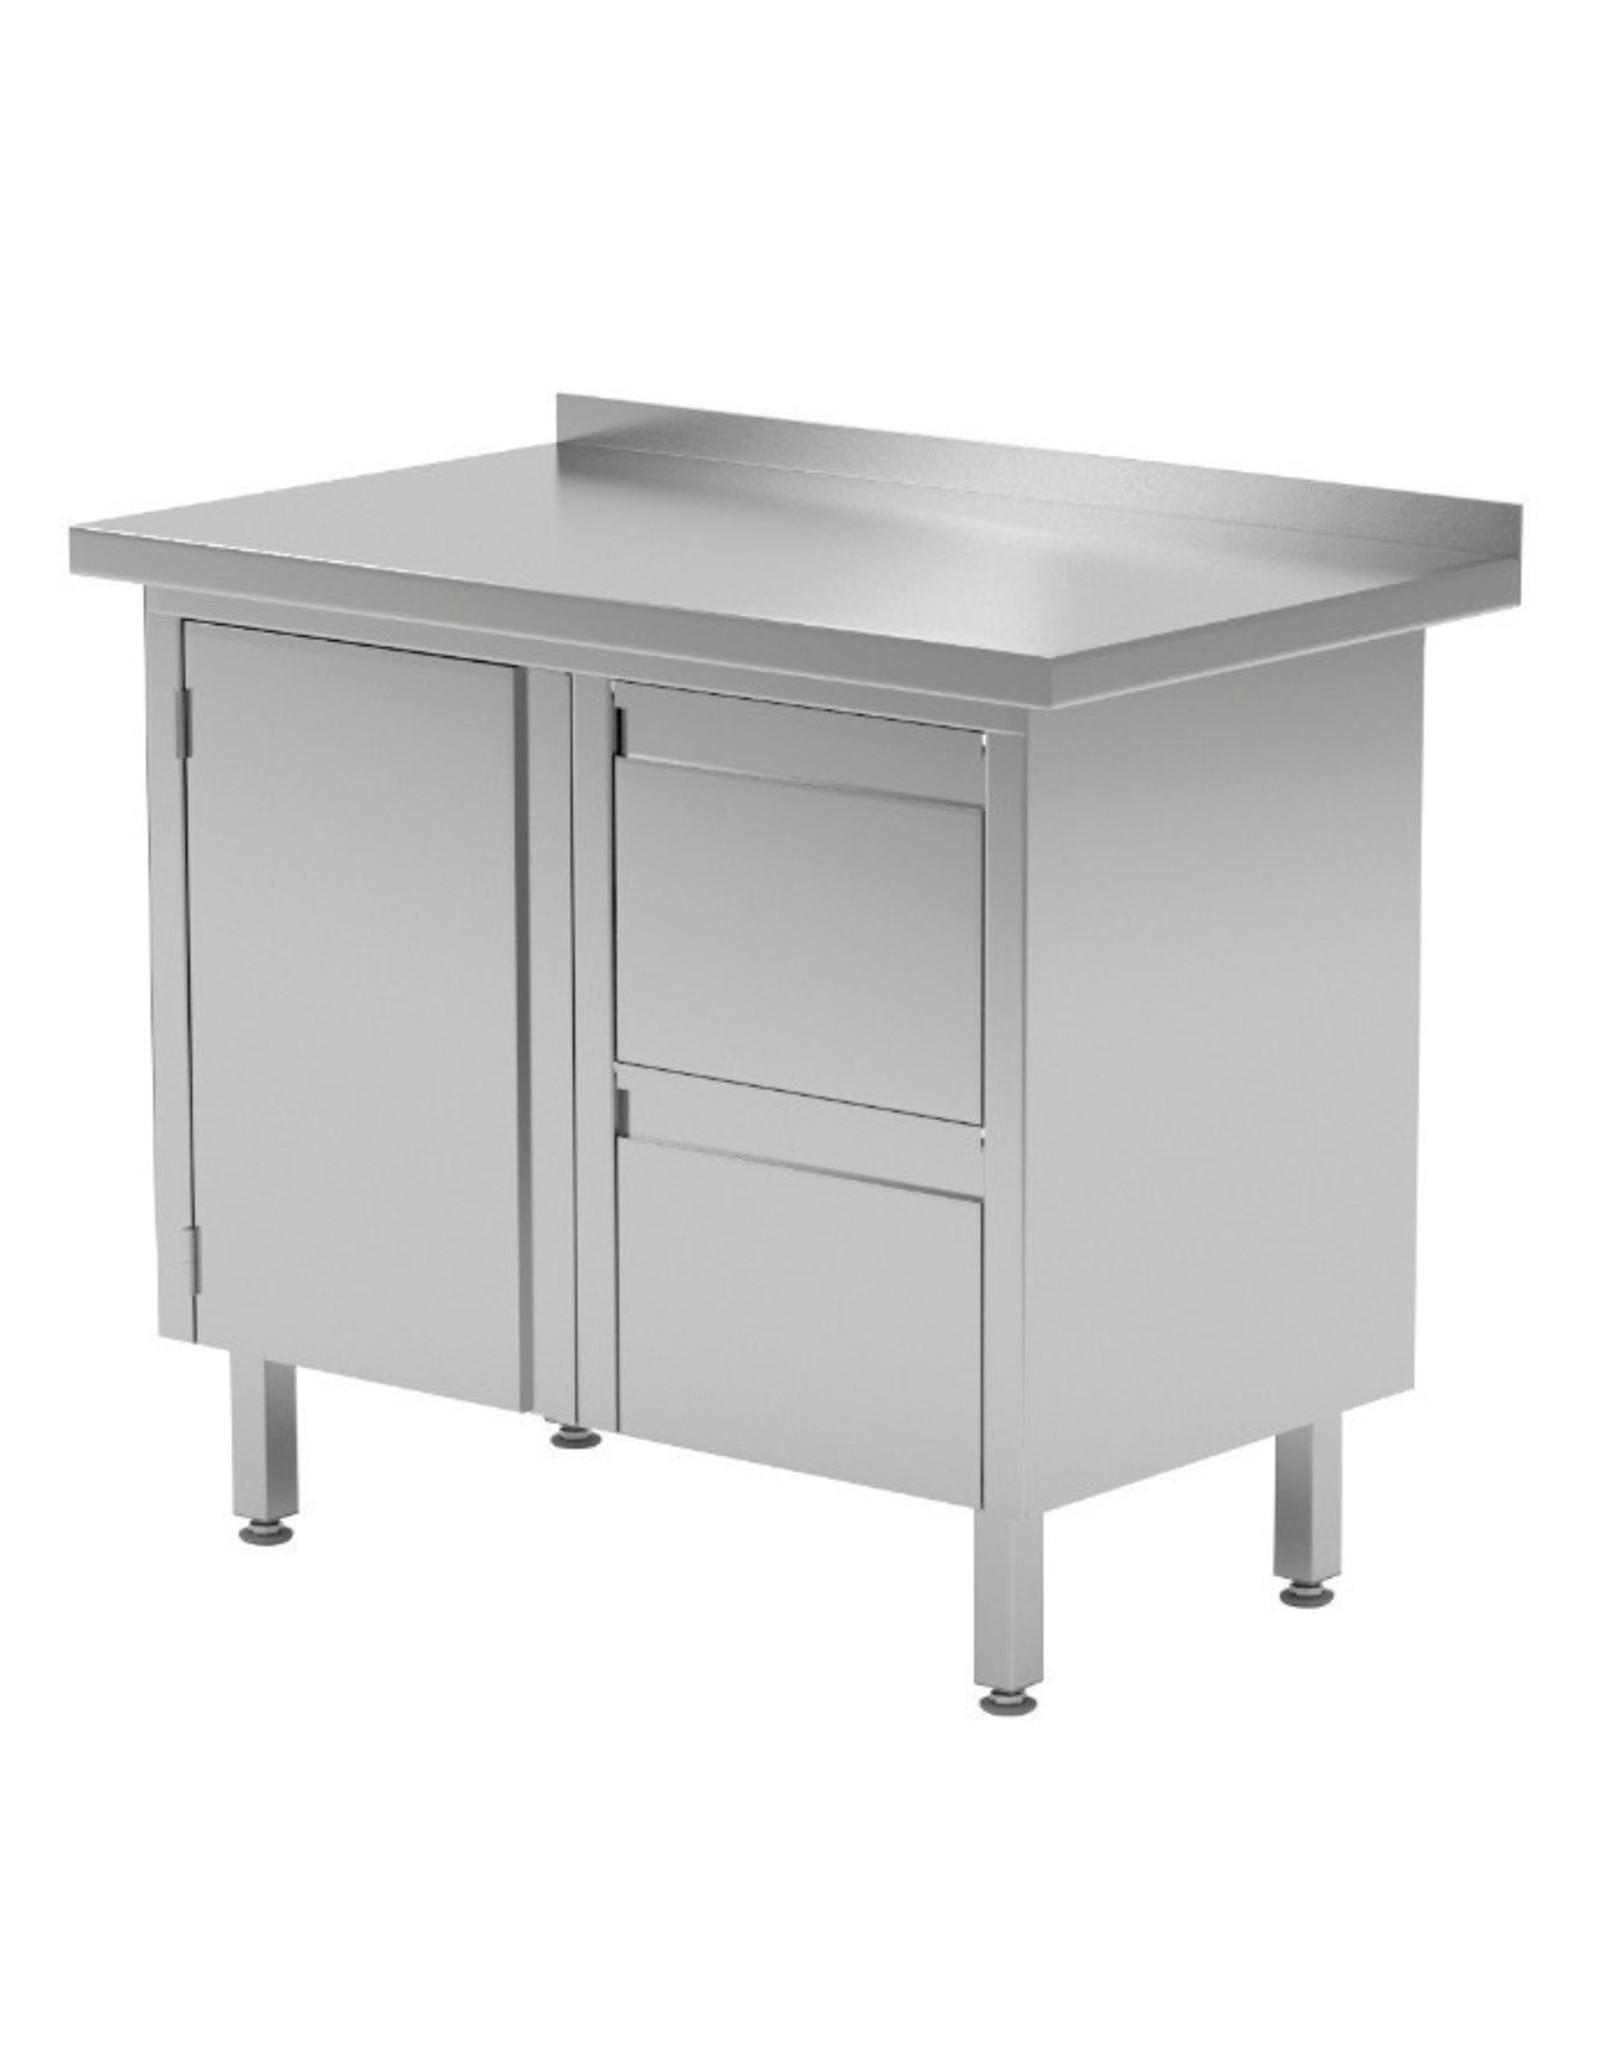 Werktafel met 2 lades rechts en klapdeur | 830-1000mm breed | 600 of 700mm diep